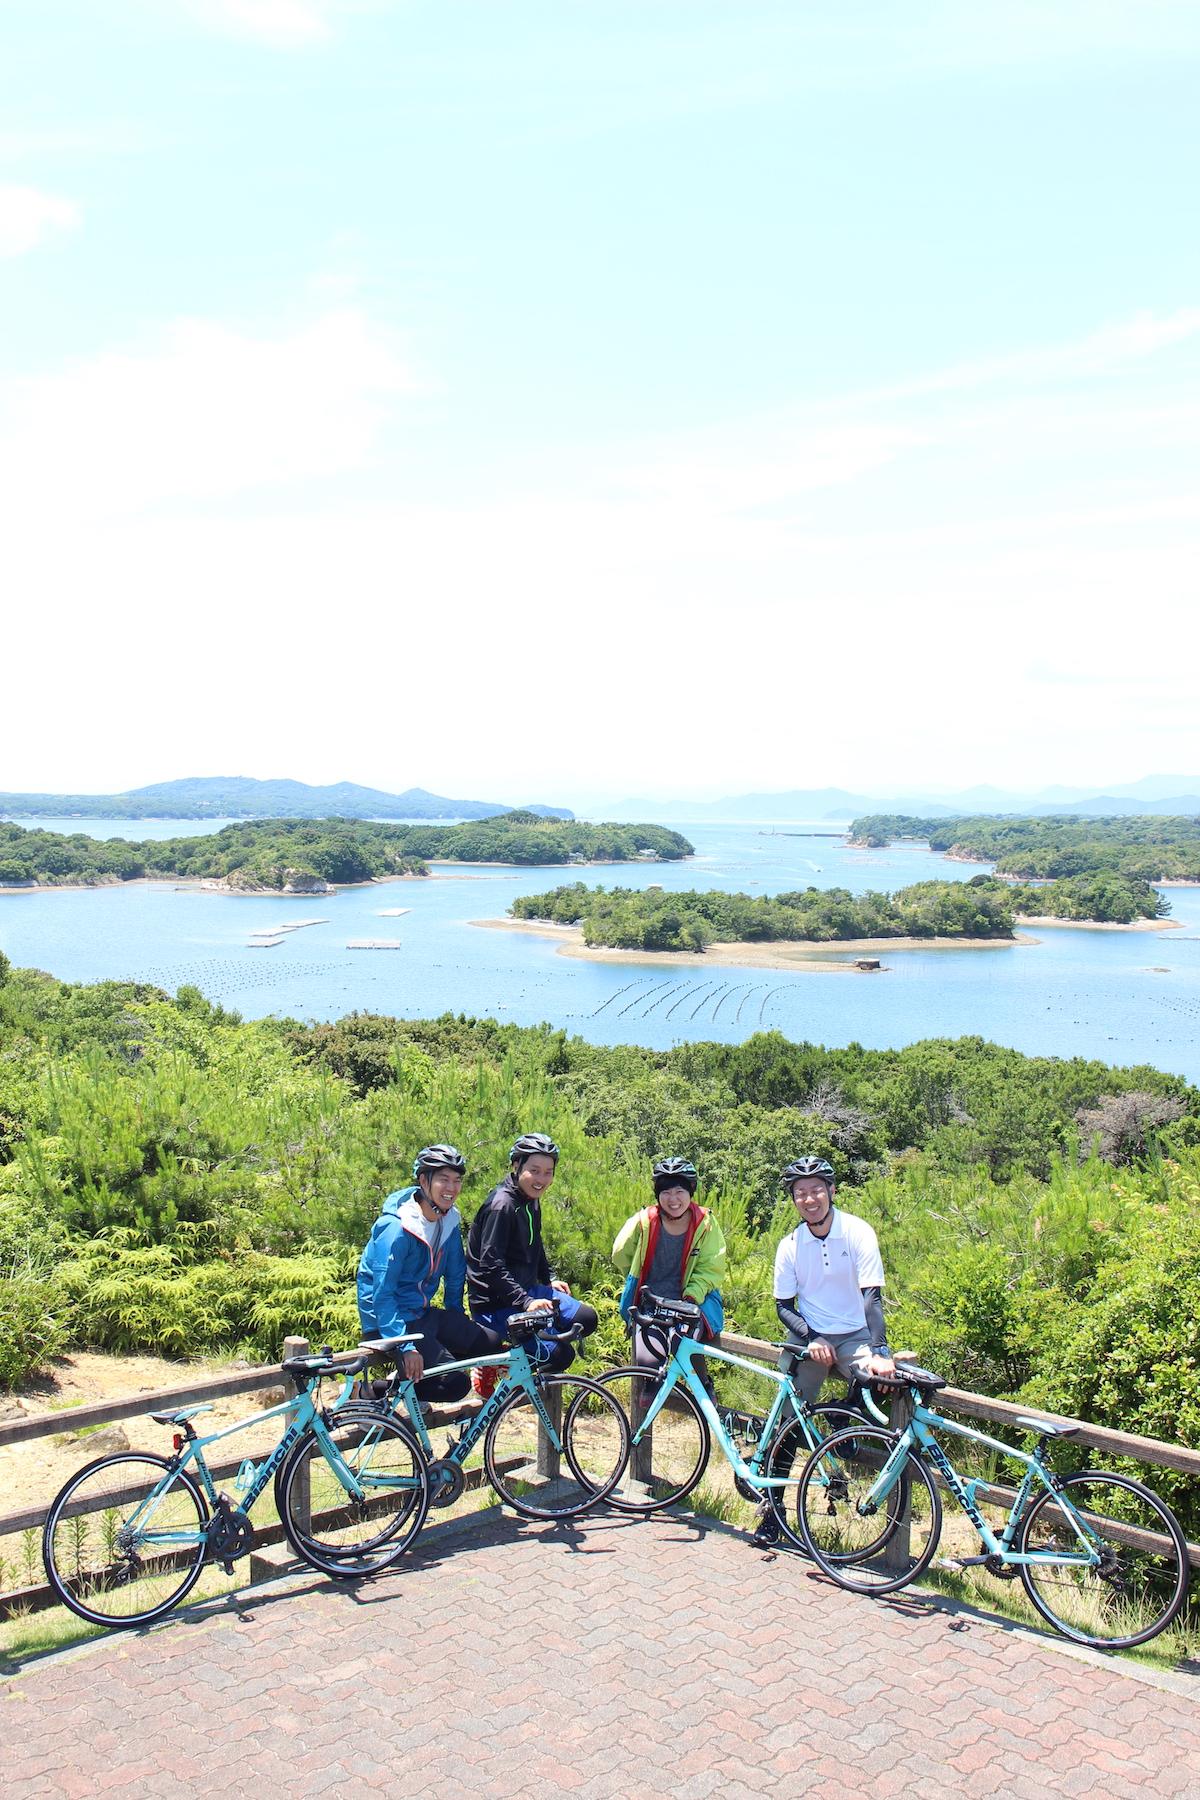 b43704f24f91284764703bfcbed6021c 【全国サイクリングコース12選】GWに行きたい、絶景やグルメなどご当地の魅力が詰まったおすすめサイクリングロードをご紹介!